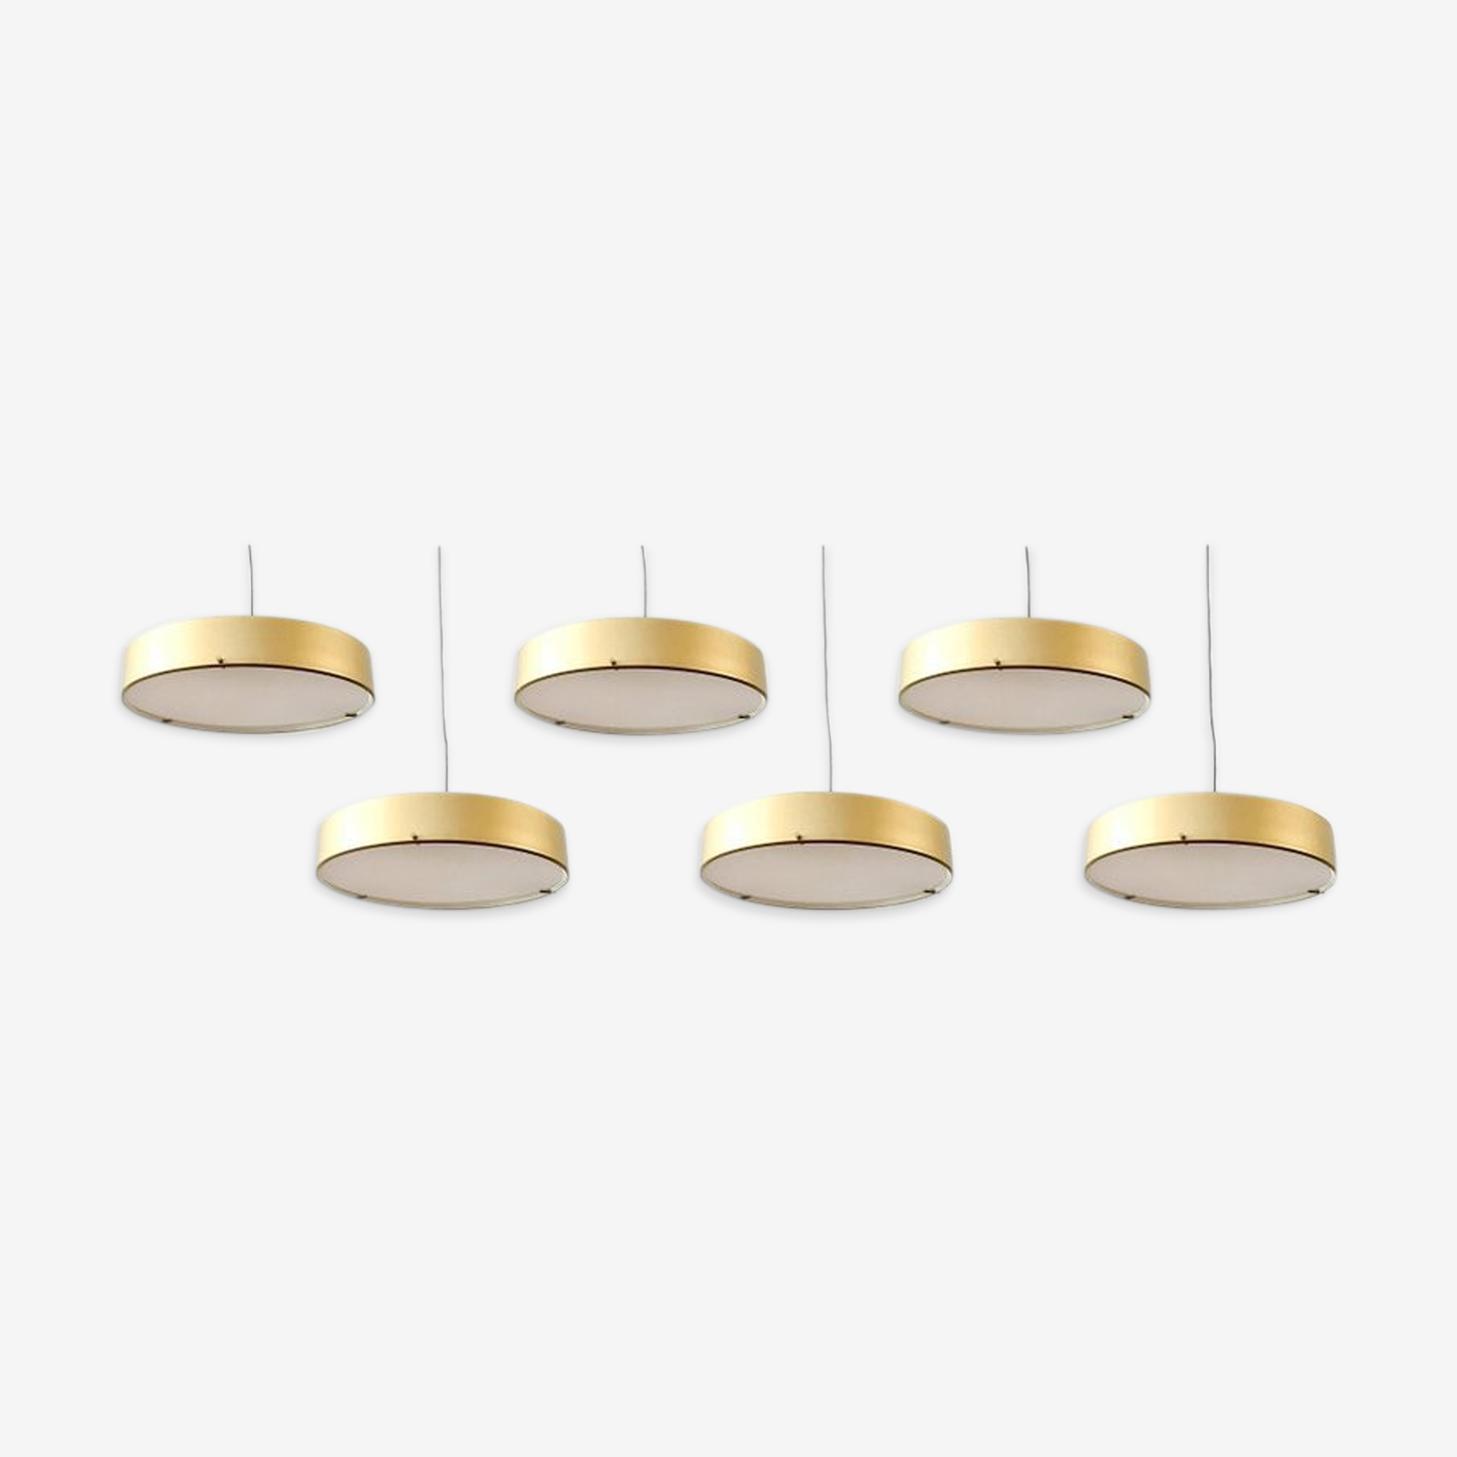 Six major suspension lamps Stilnovo model 288, 50 years